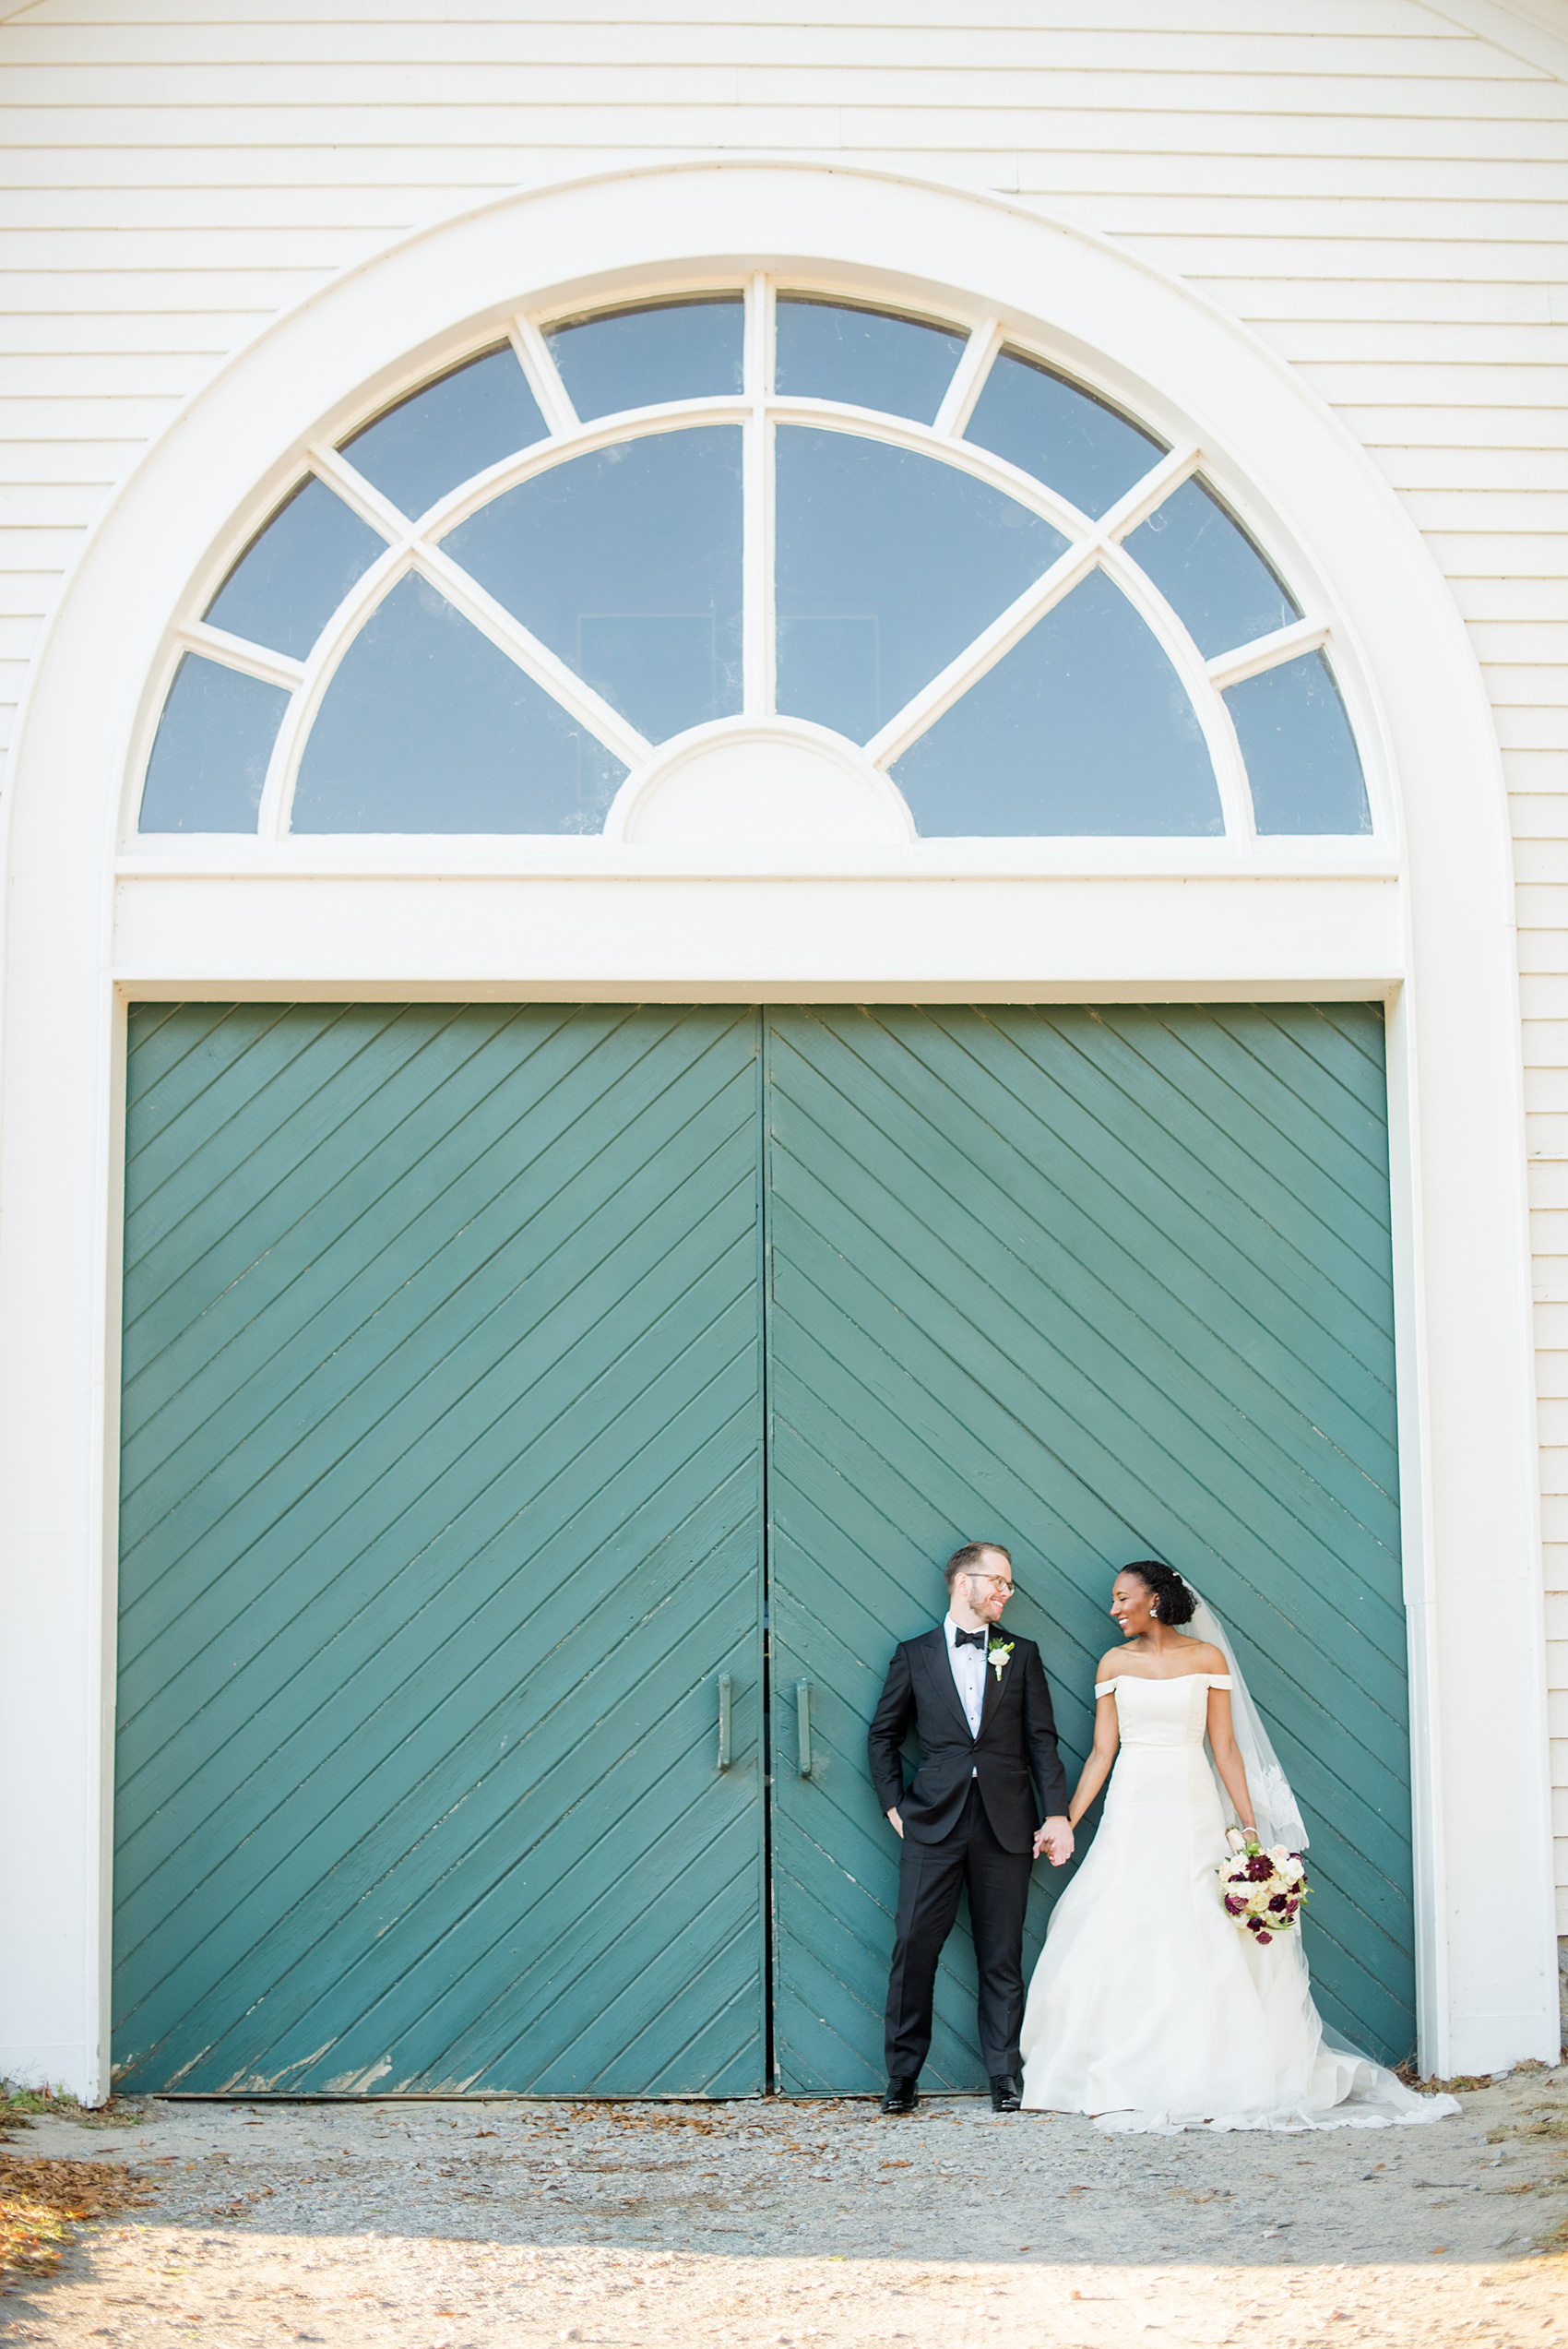 Greenville NC Wedding Photos at Rock Springs Center • Ashli